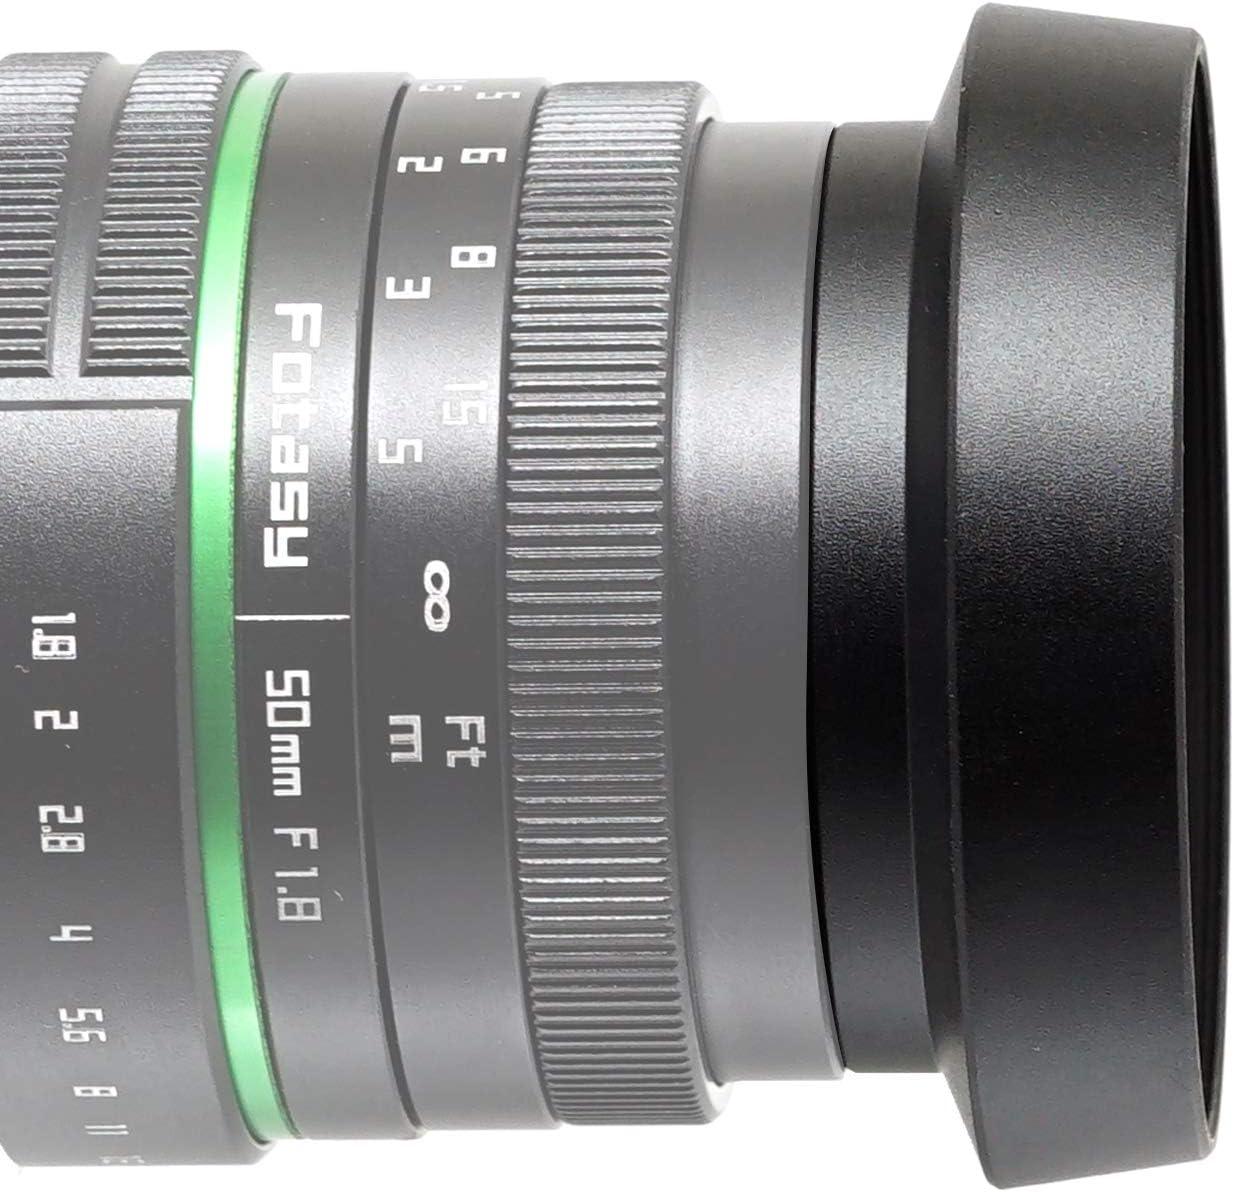 46mm Curved Lens Hood Panasonic 20mm f1.7 Lens Hood Fotasy Metal Screw-In Lens Hood for Panasonic Lumix 14mm F2.5 //Panasonic 20mm f1.7 Lens// Leica DG 25mm F1.4 Lens// Olympus M.Zuiko 17mm f1.8 Lens